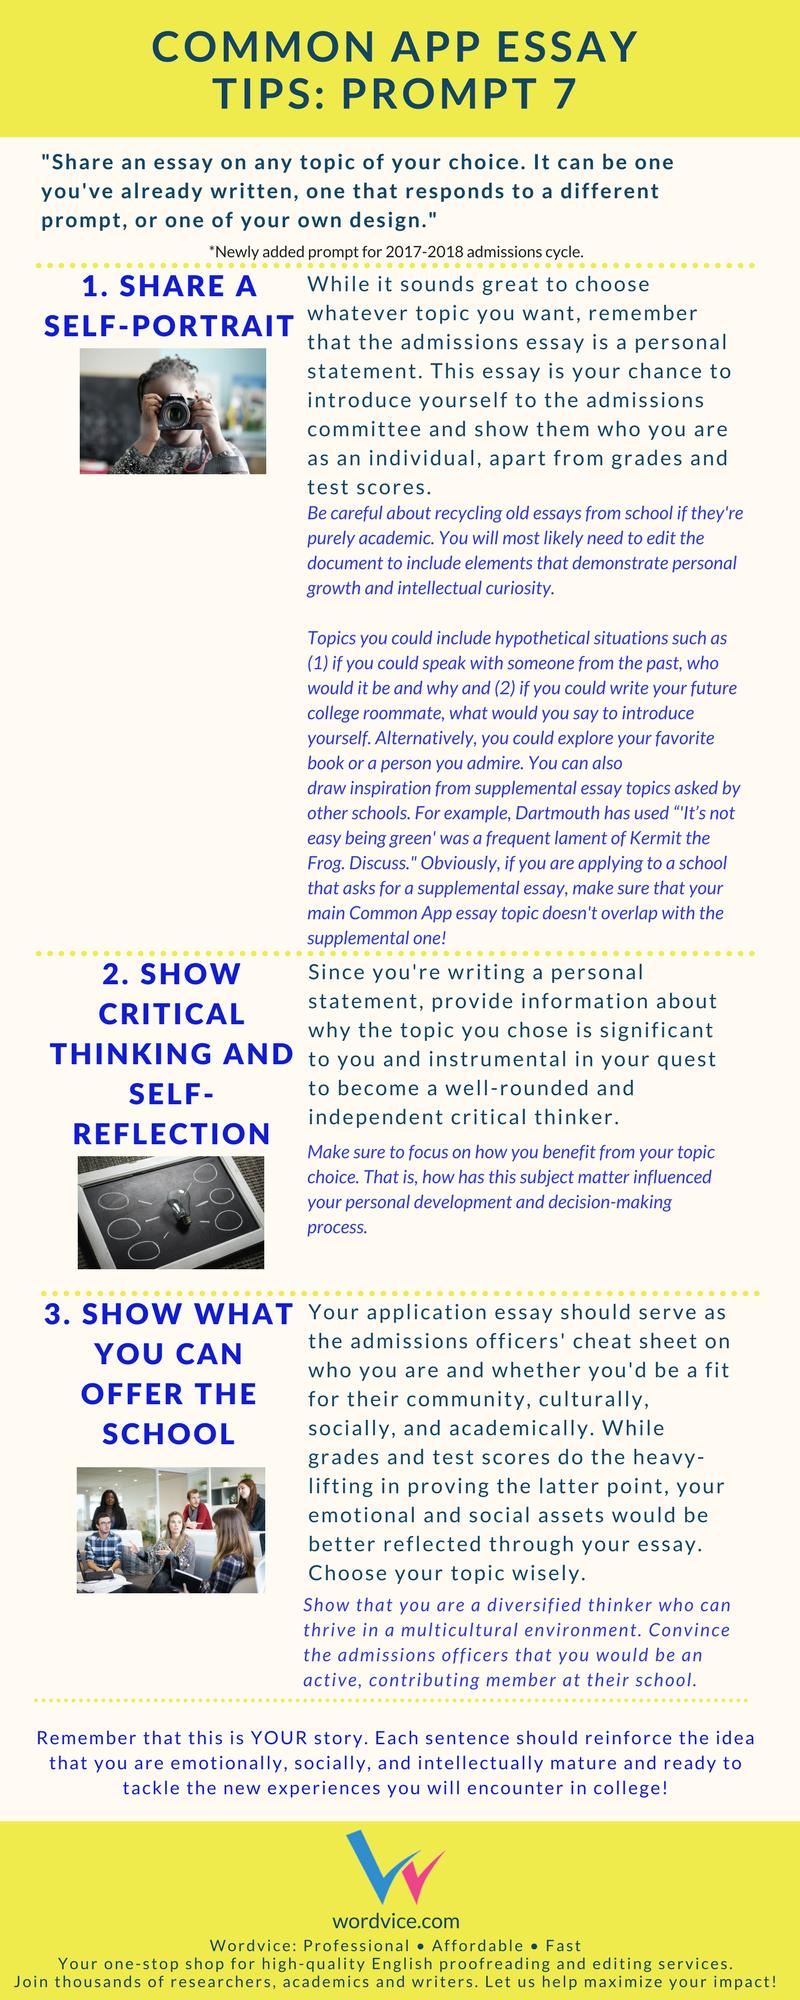 004 Essay Example Common App Prompts Brainstormprompt Wonderful 2017 Examples Full